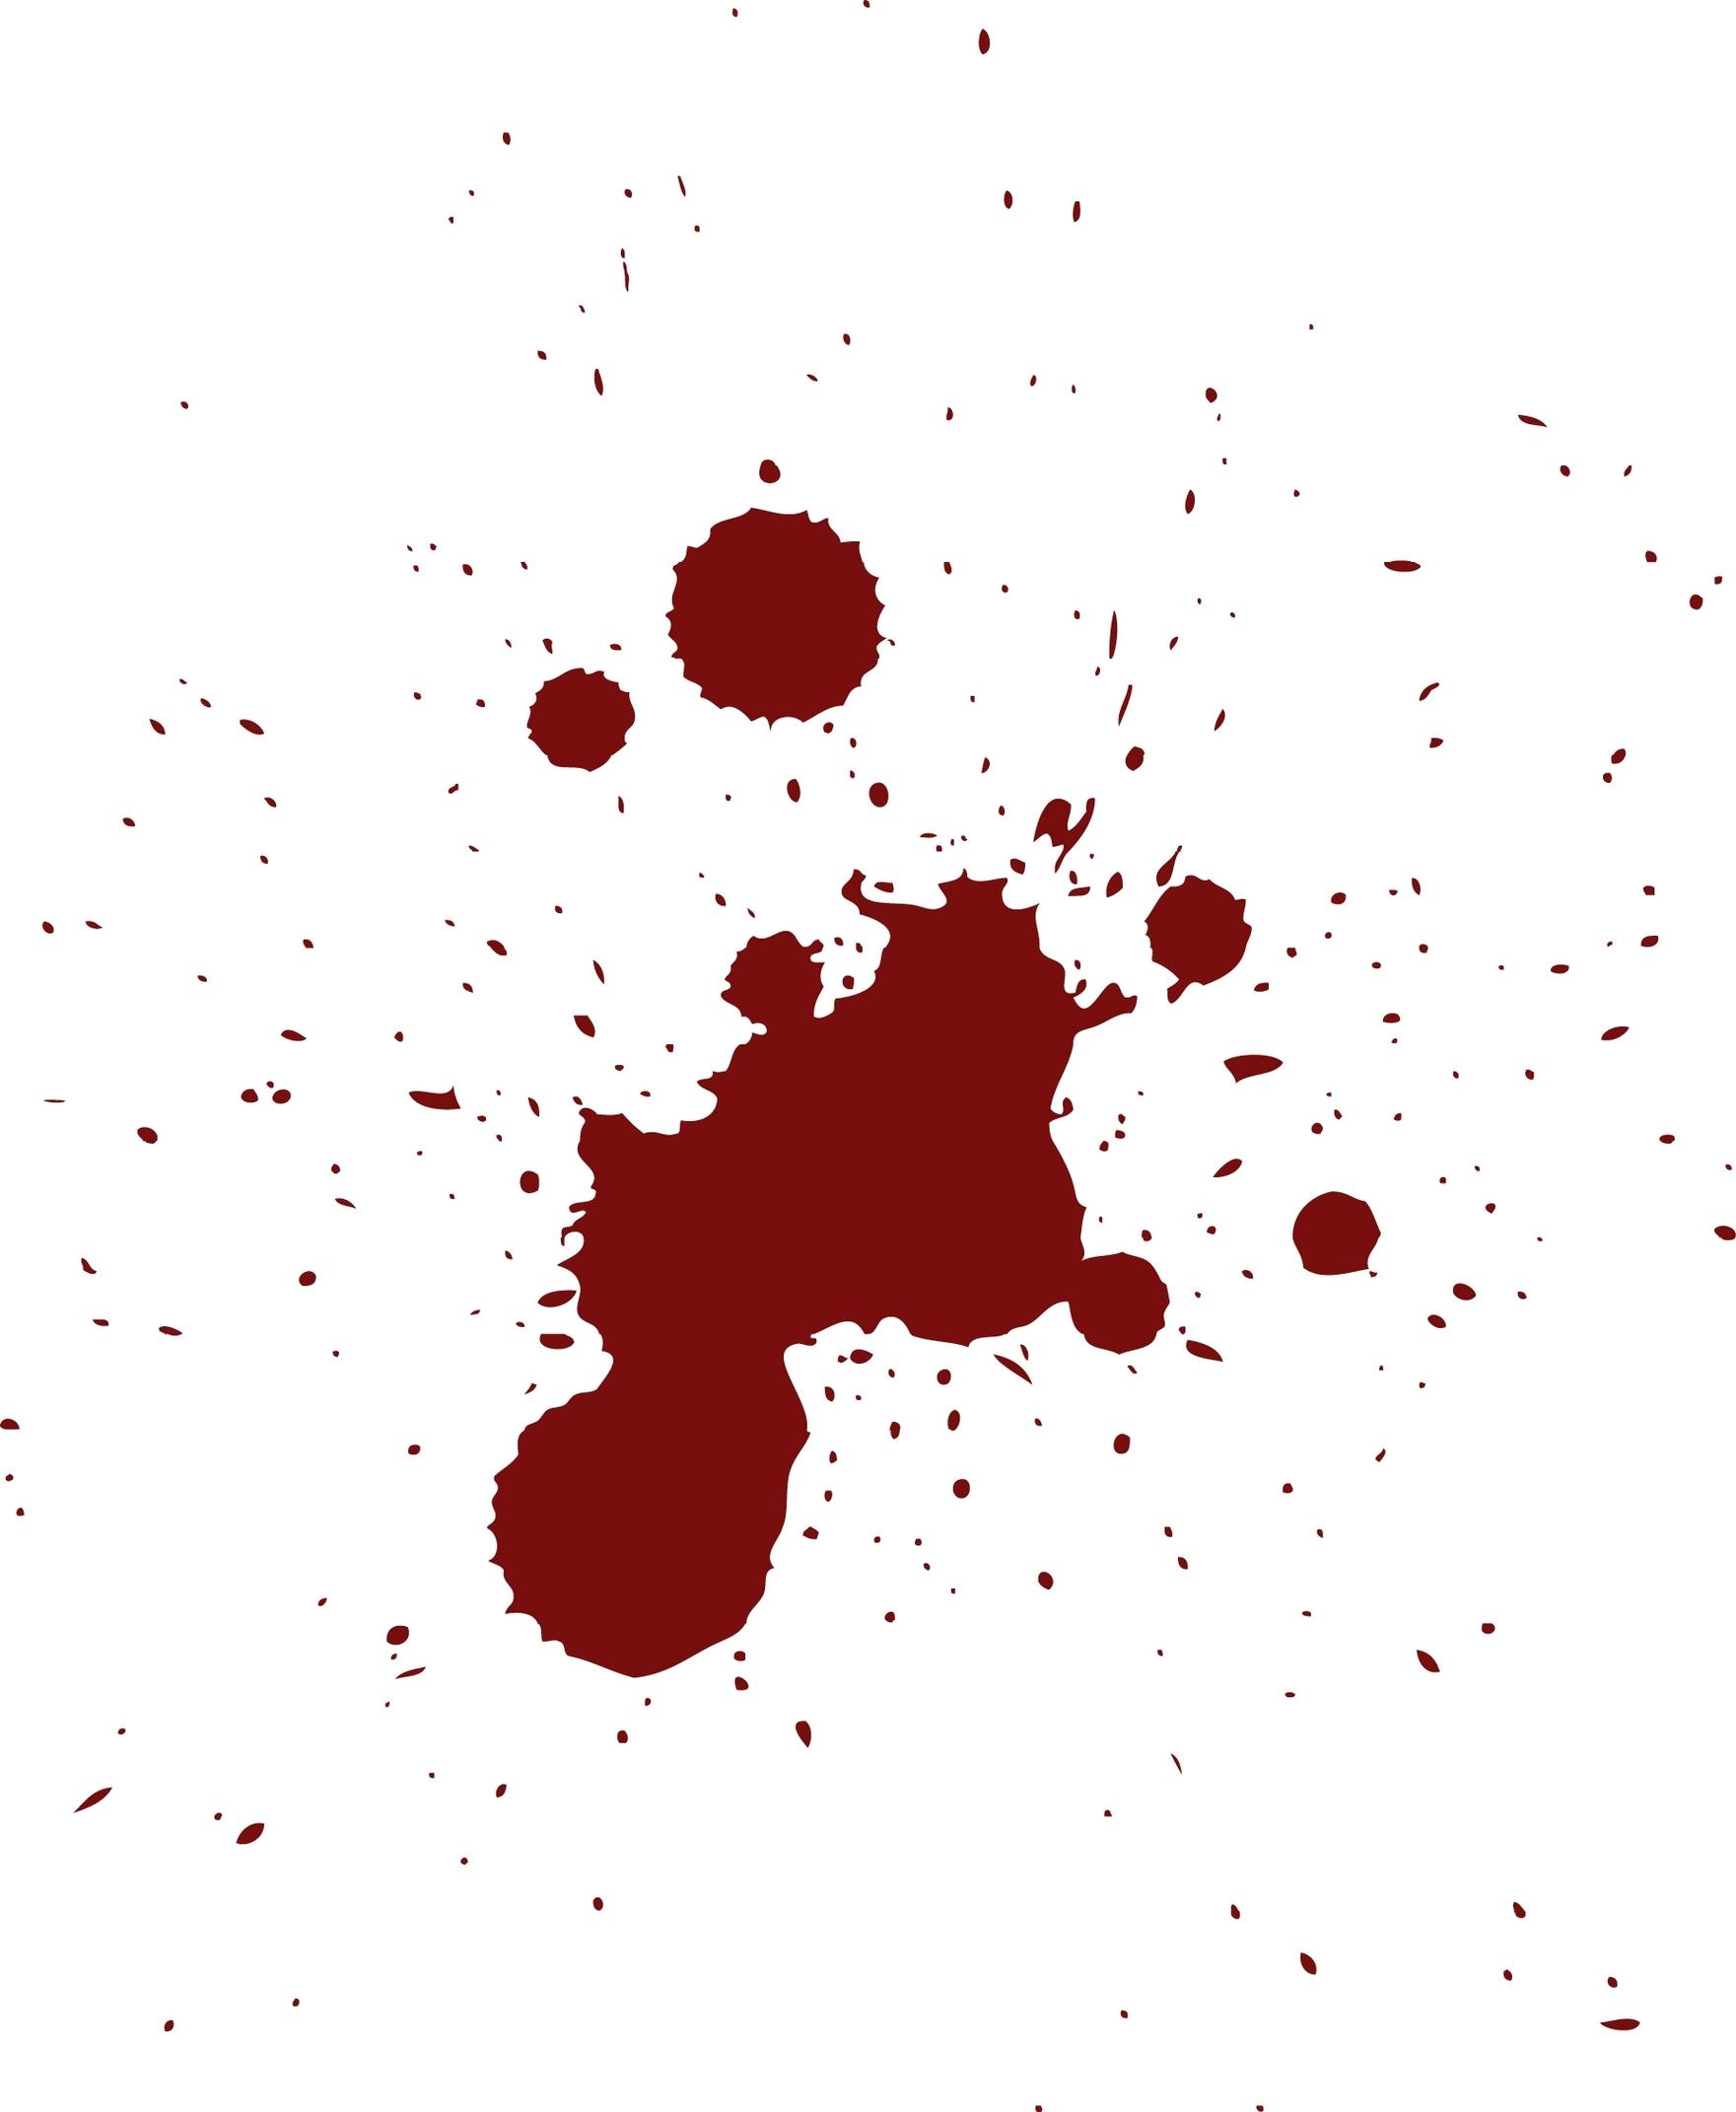 Blood Splatter Png Clipart - Blood Splatter Clipart